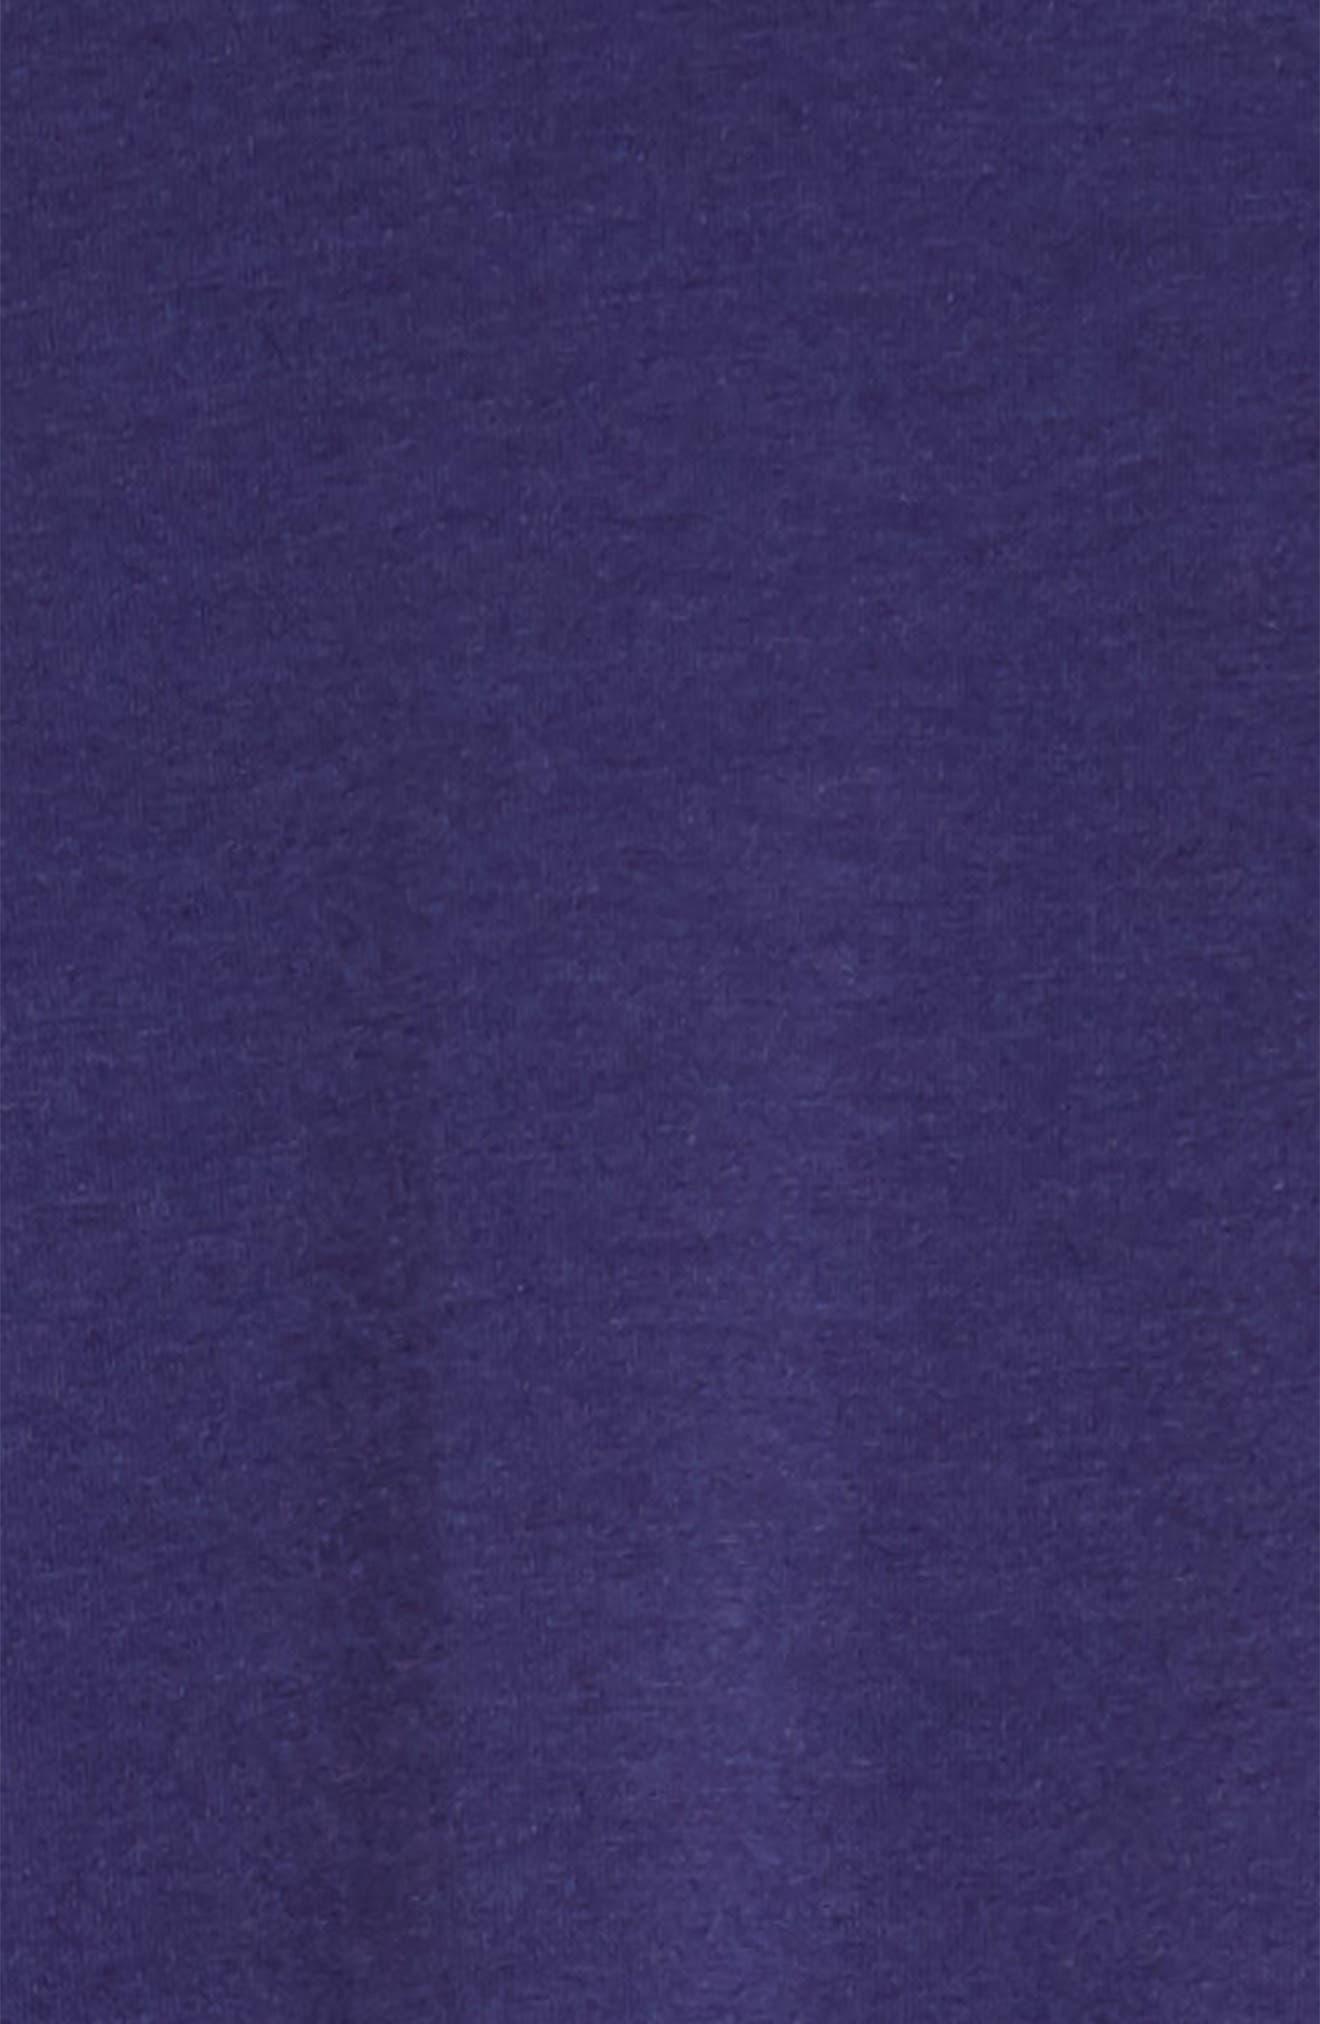 Popover Knit Tank Dress,                             Alternate thumbnail 3, color,                             Navy Ribbon